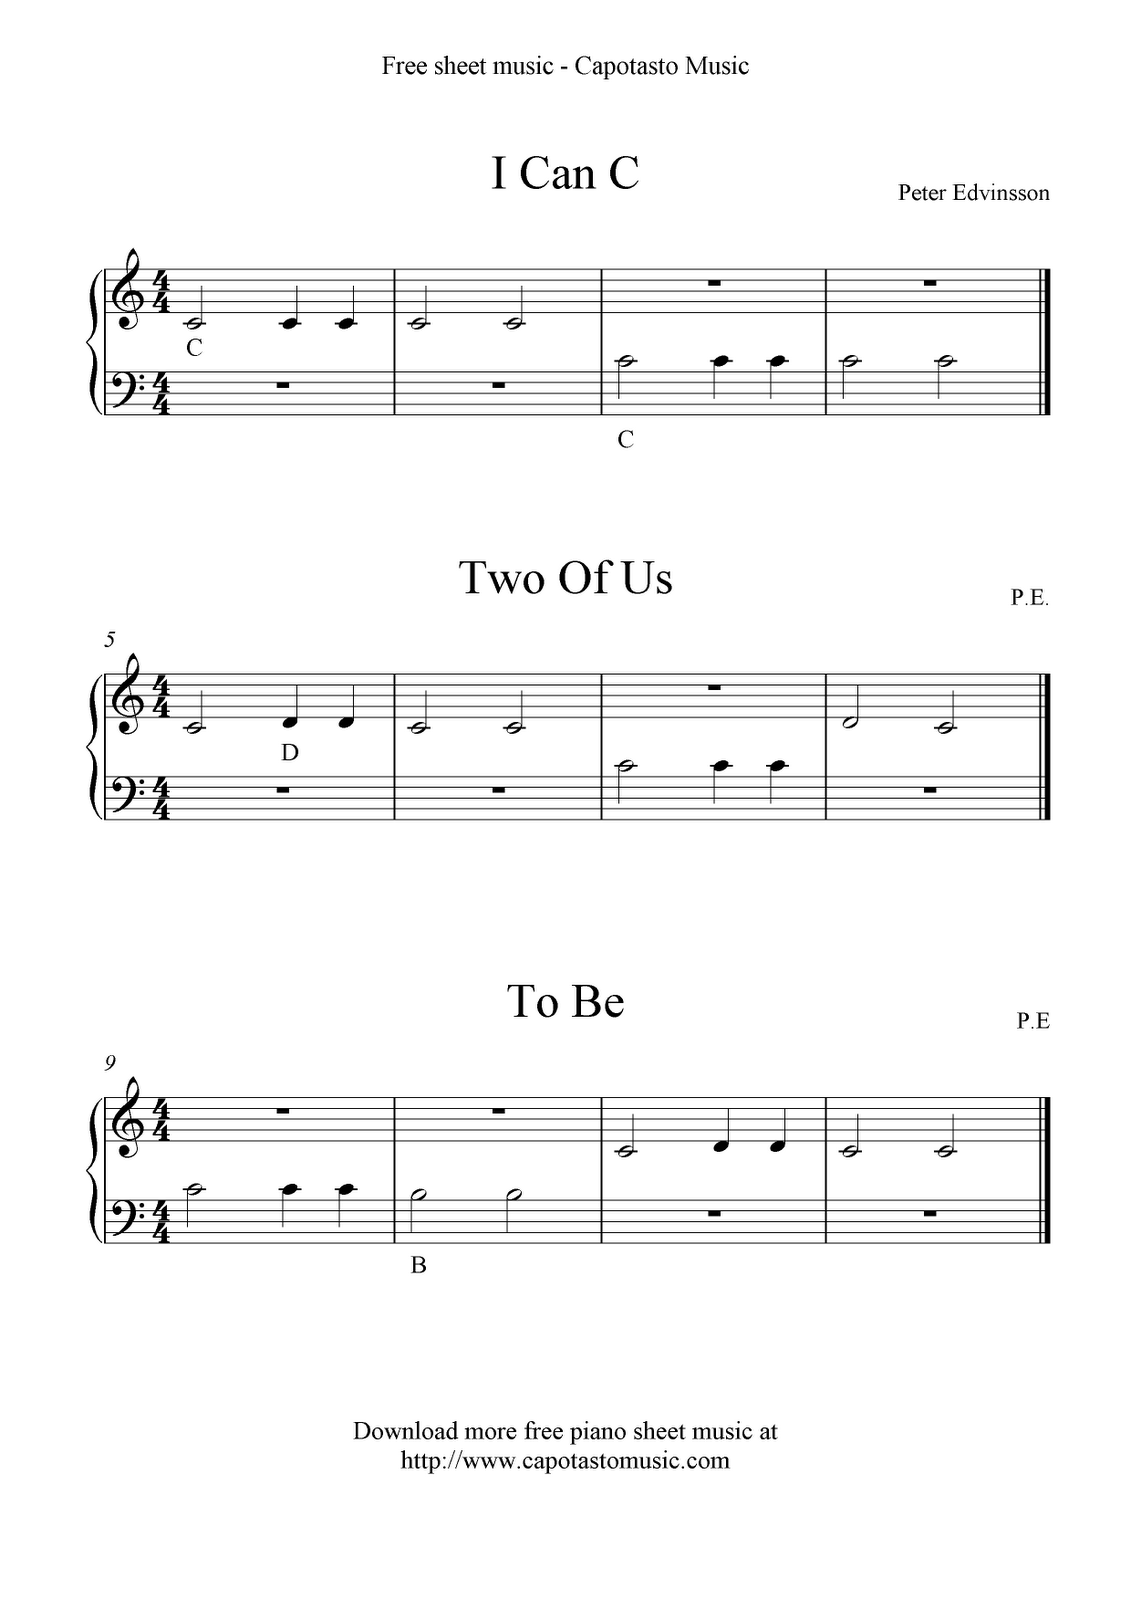 basic piano music sheets music piano sheet music piano music music